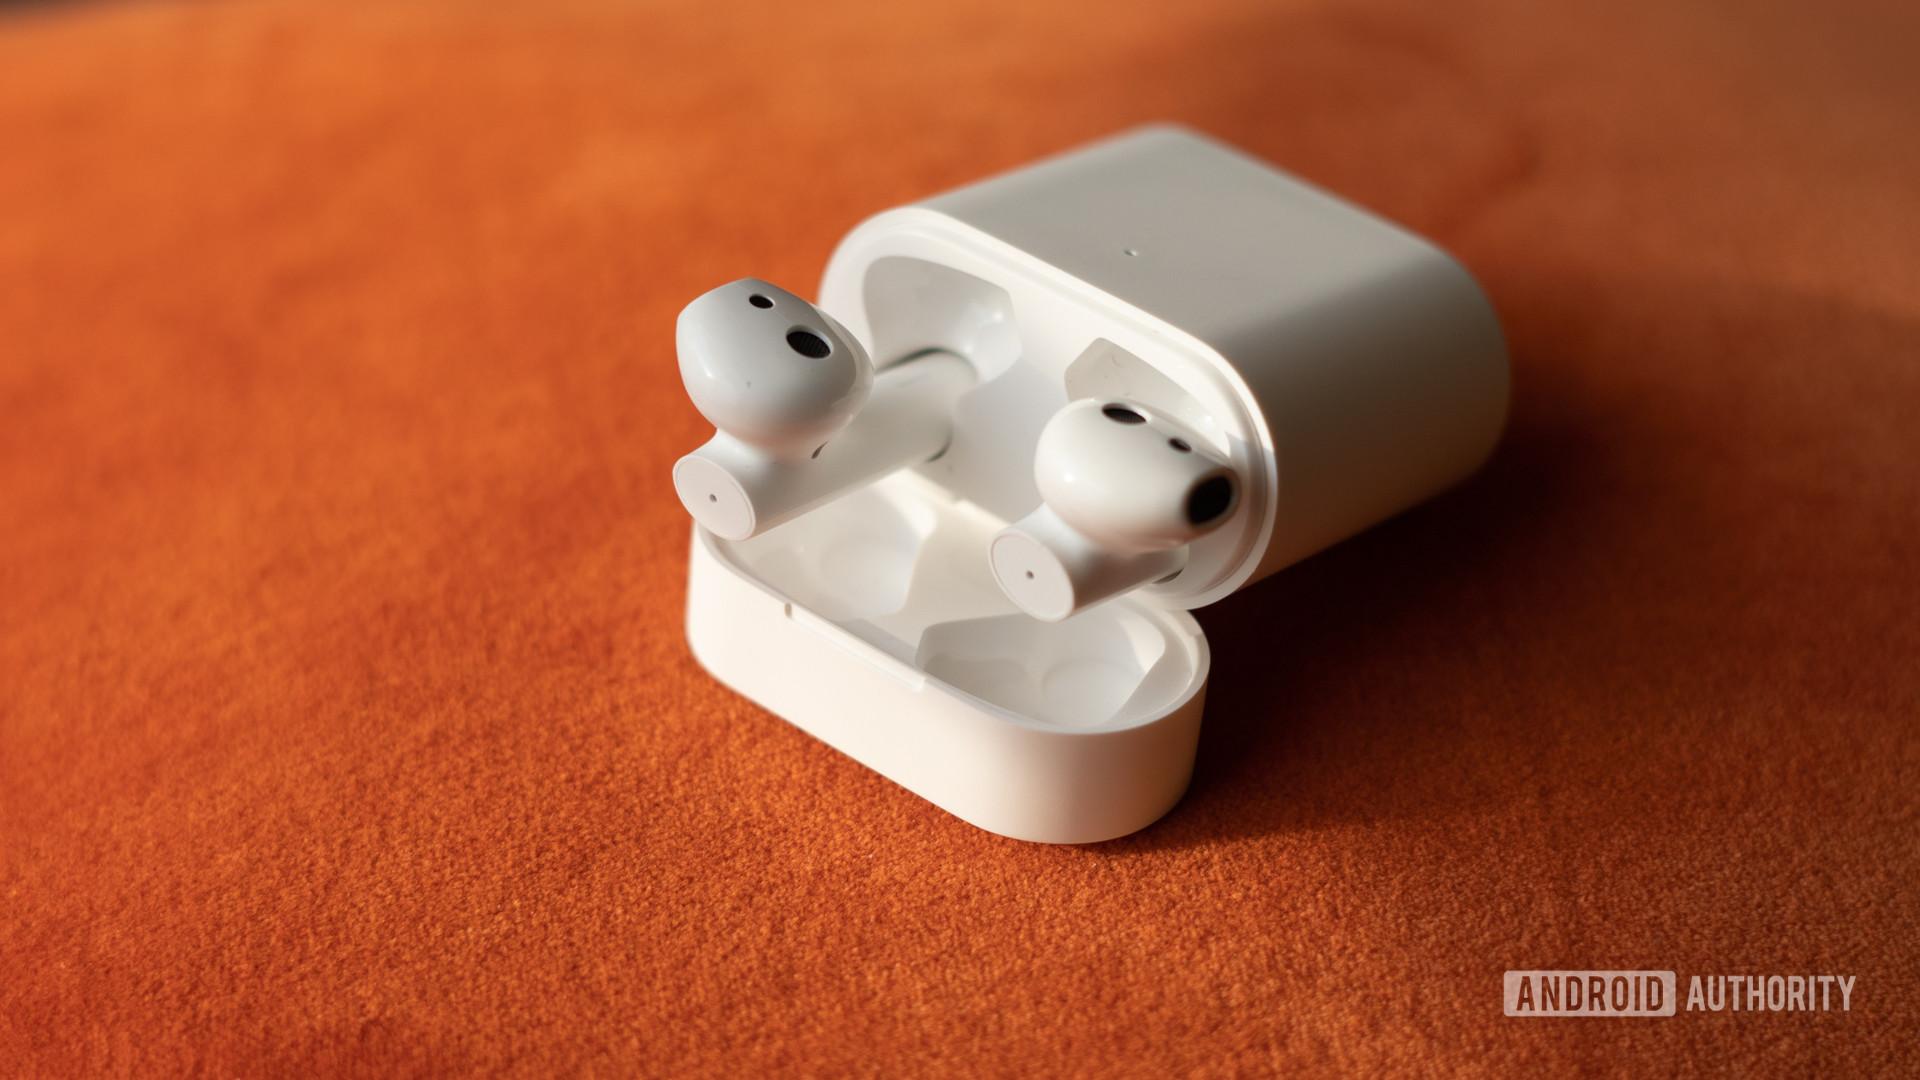 Image of Xiaomi True Wireless Earphones 2 earbuds in case